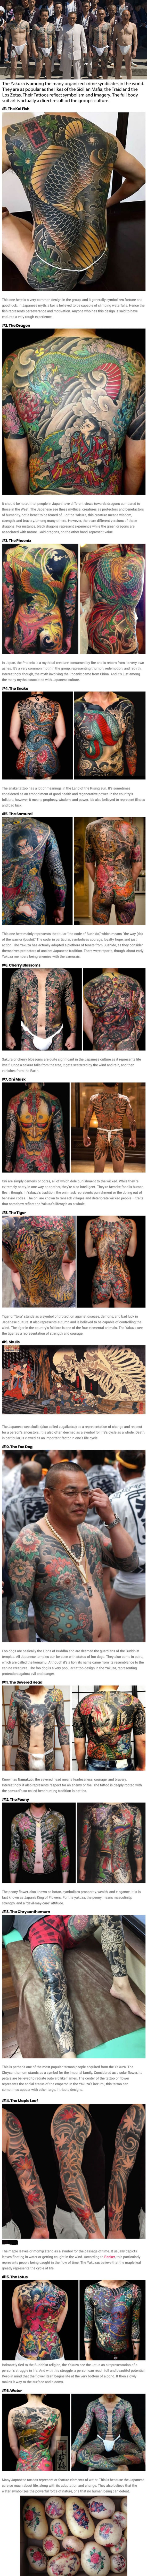 16 Fascinating Japanese Yakuza Tattoos And Their Hidden Symbolic Meaning